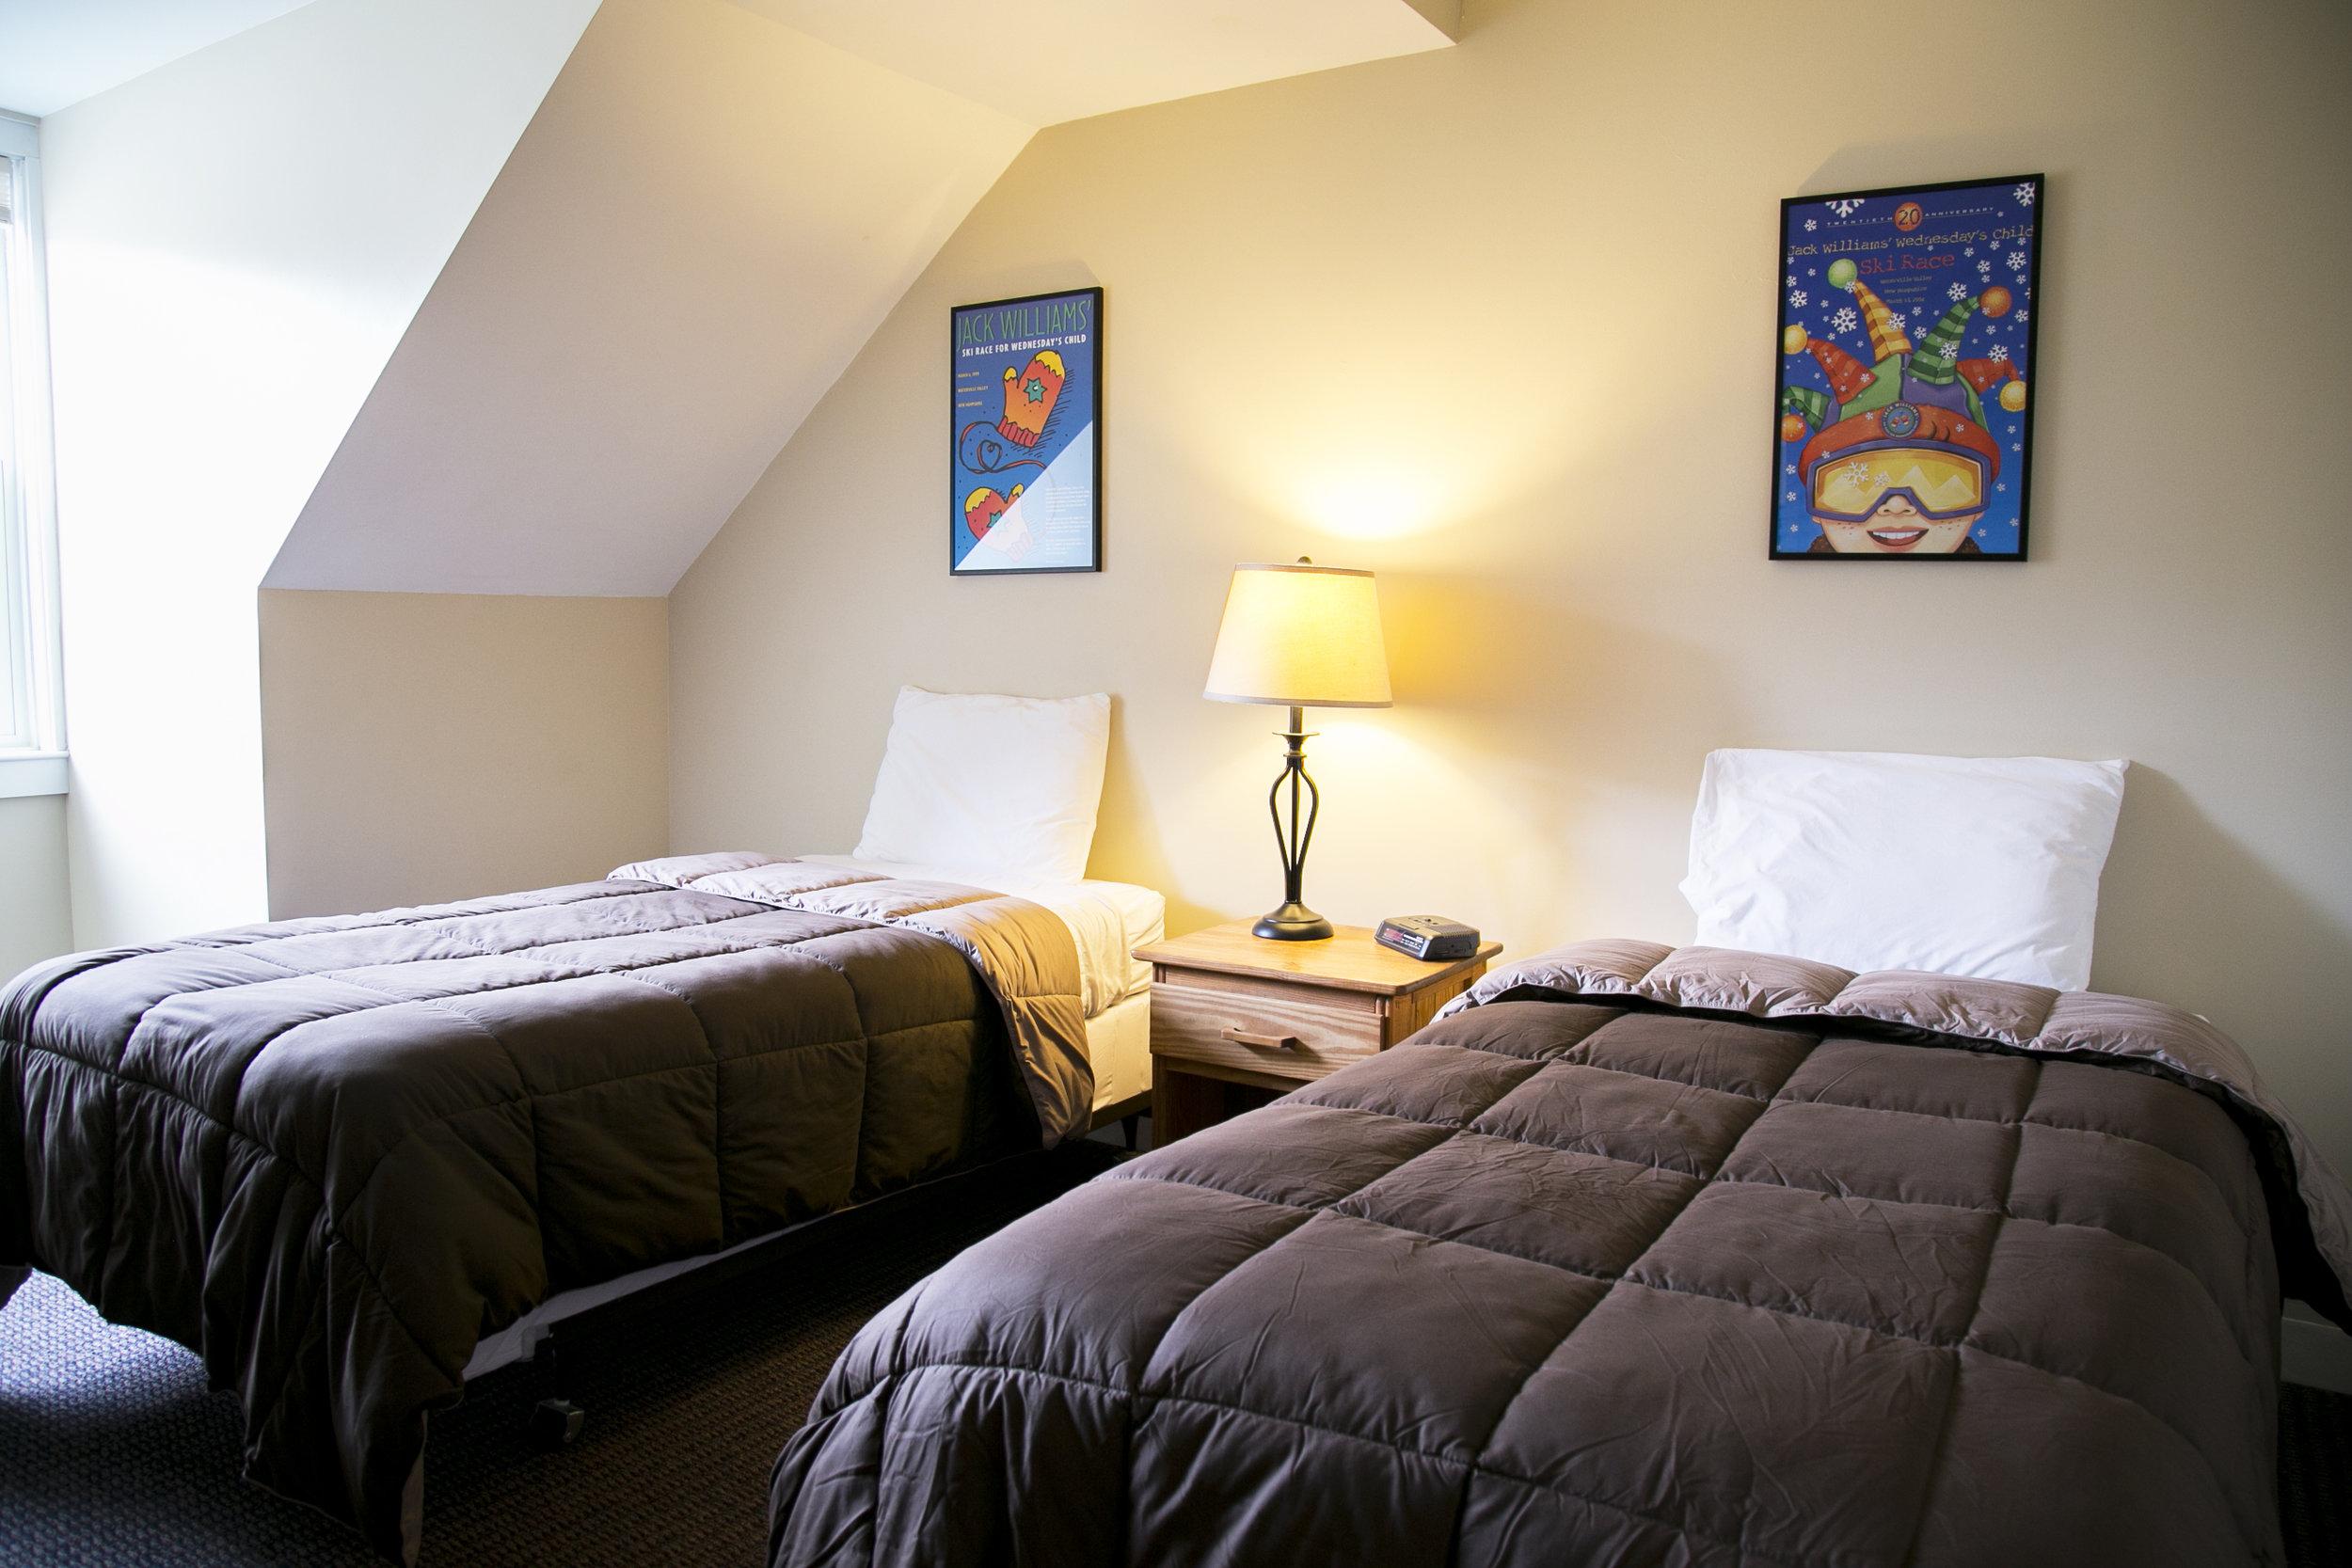 Town Square Condo's Double Bedroom